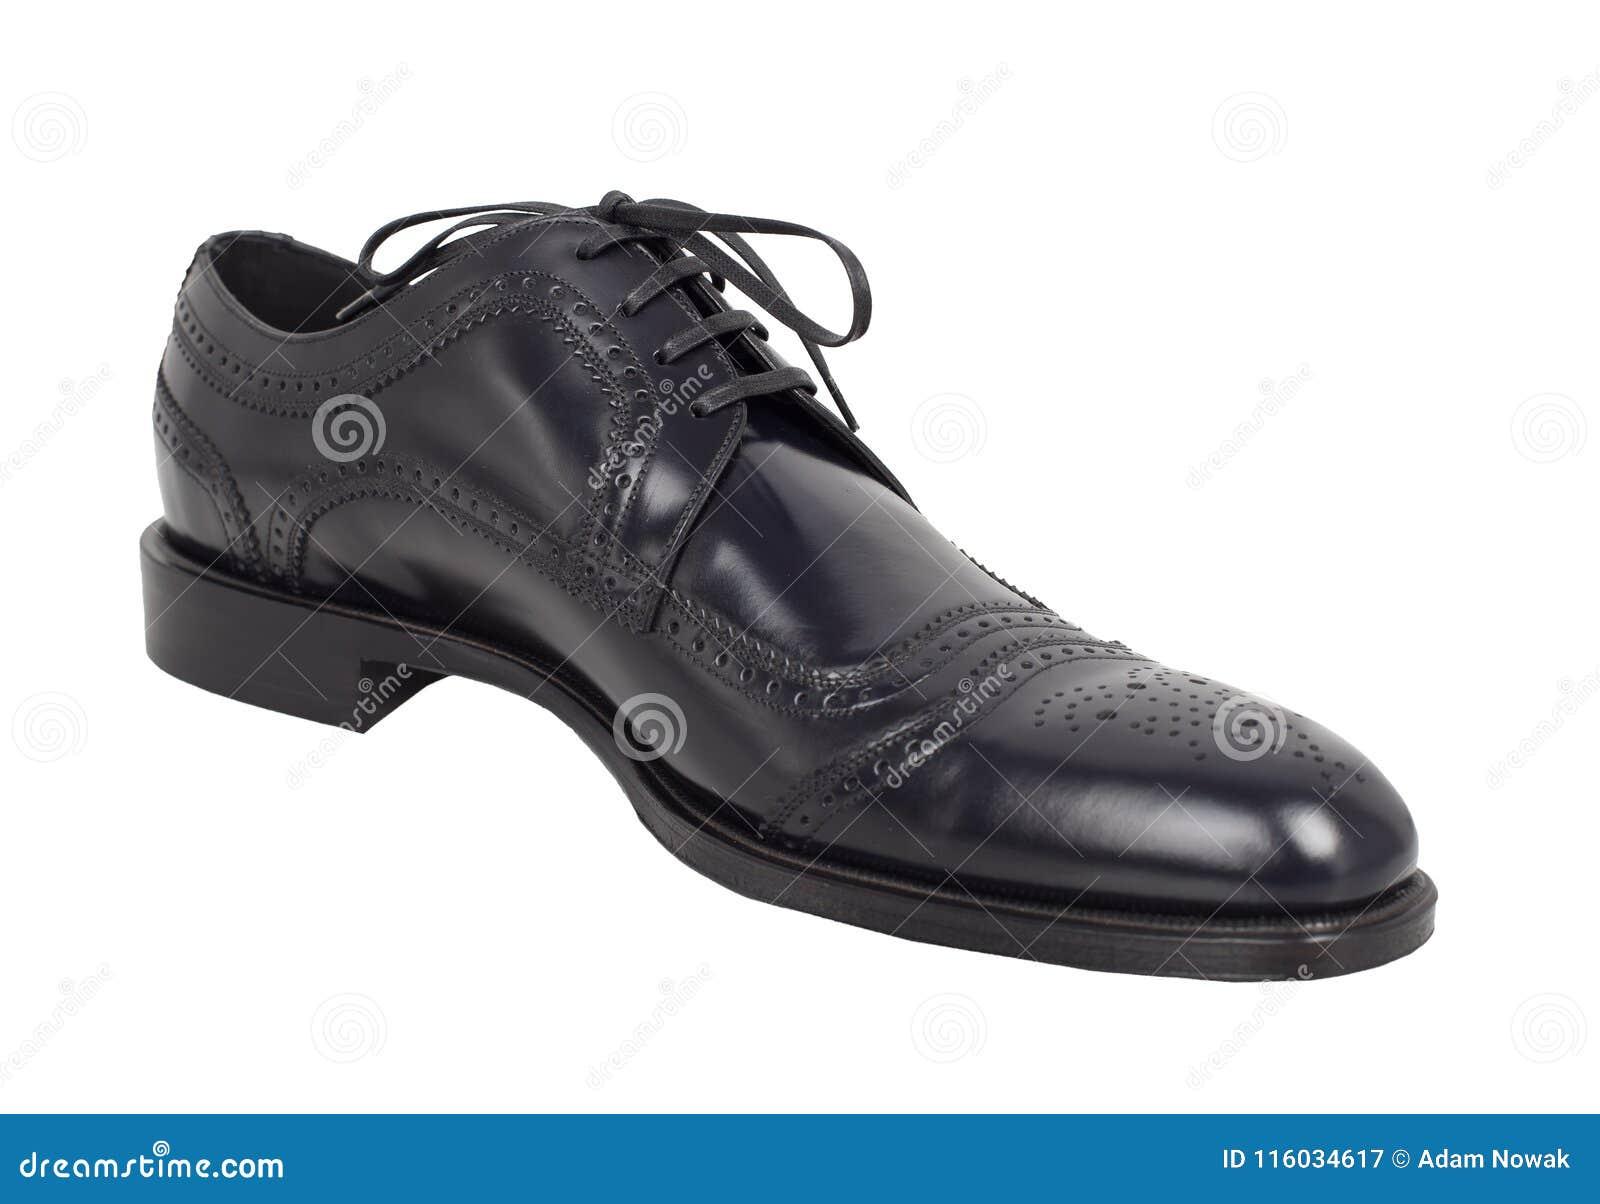 Los De Imagen Aislados S Zapatos ` Clásicos Del Hombres Oscuros 7wqnnRY1XT